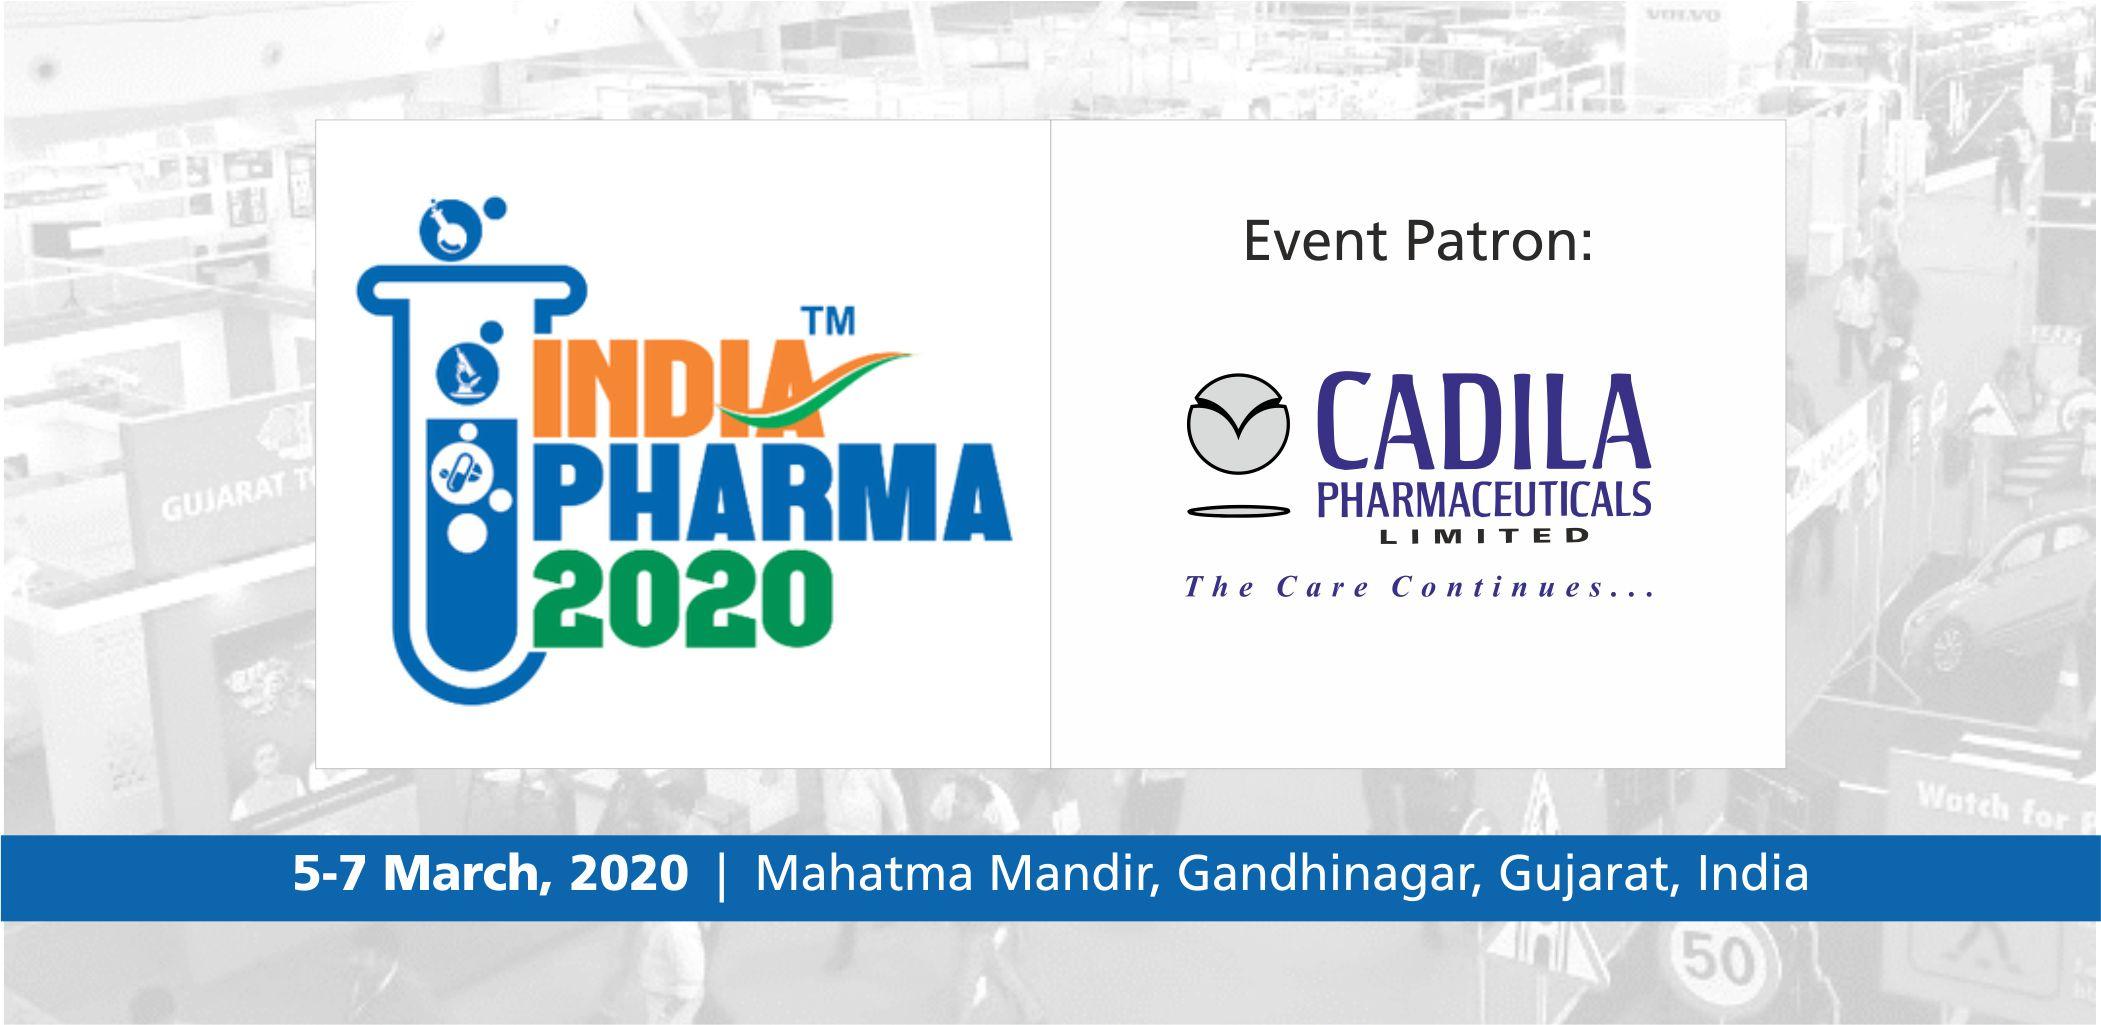 India Pharma 2020 - Event Patron